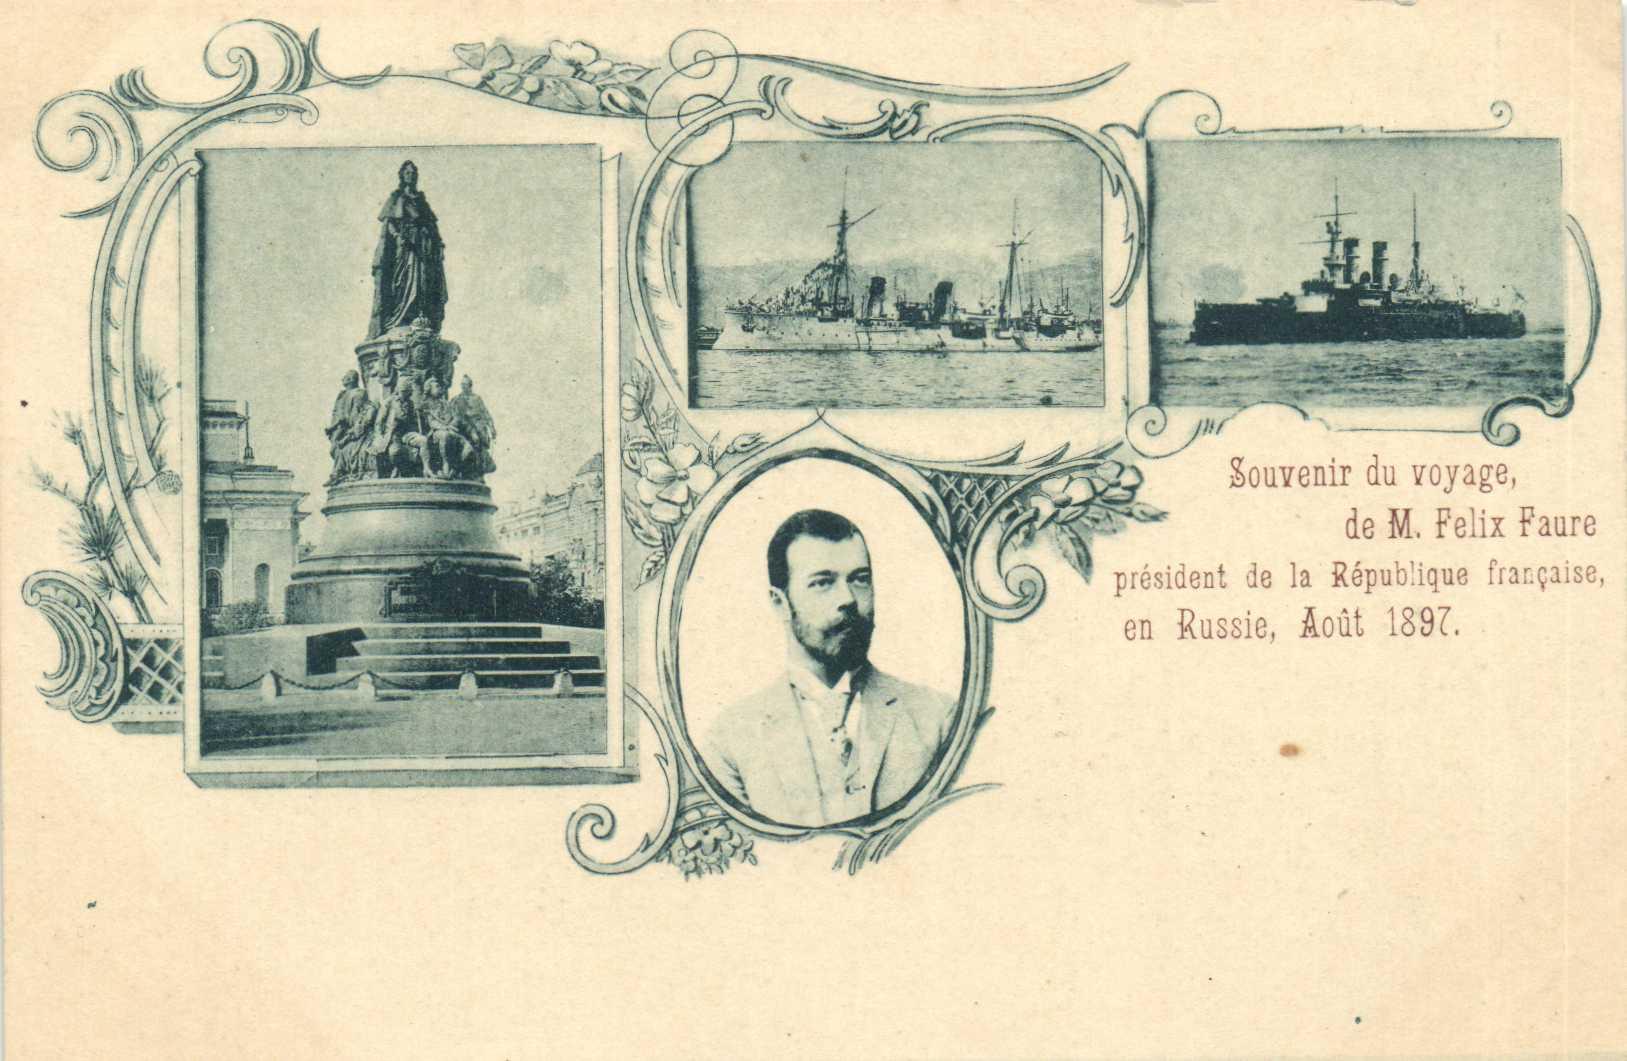 На память о визите президента Франции Феликса Фора в Россию